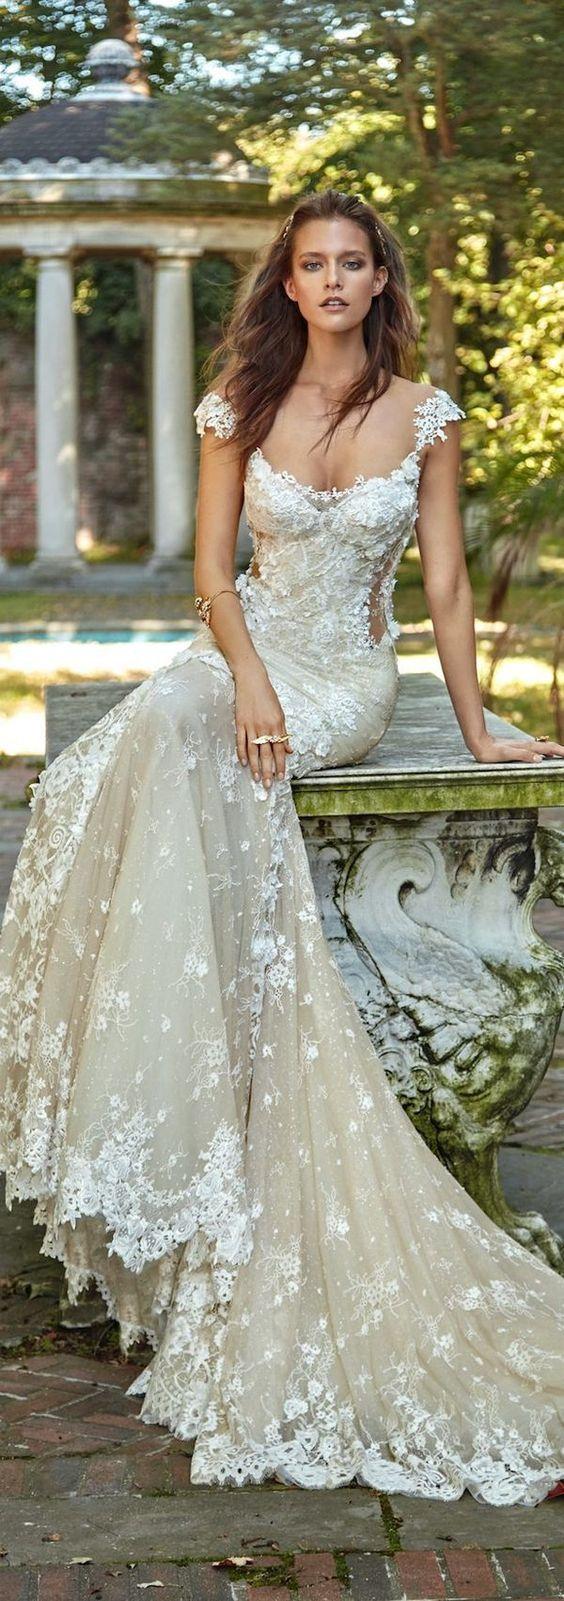 Mermaid dress wedding  weddingdressesweddingglamorousmermaidwedding